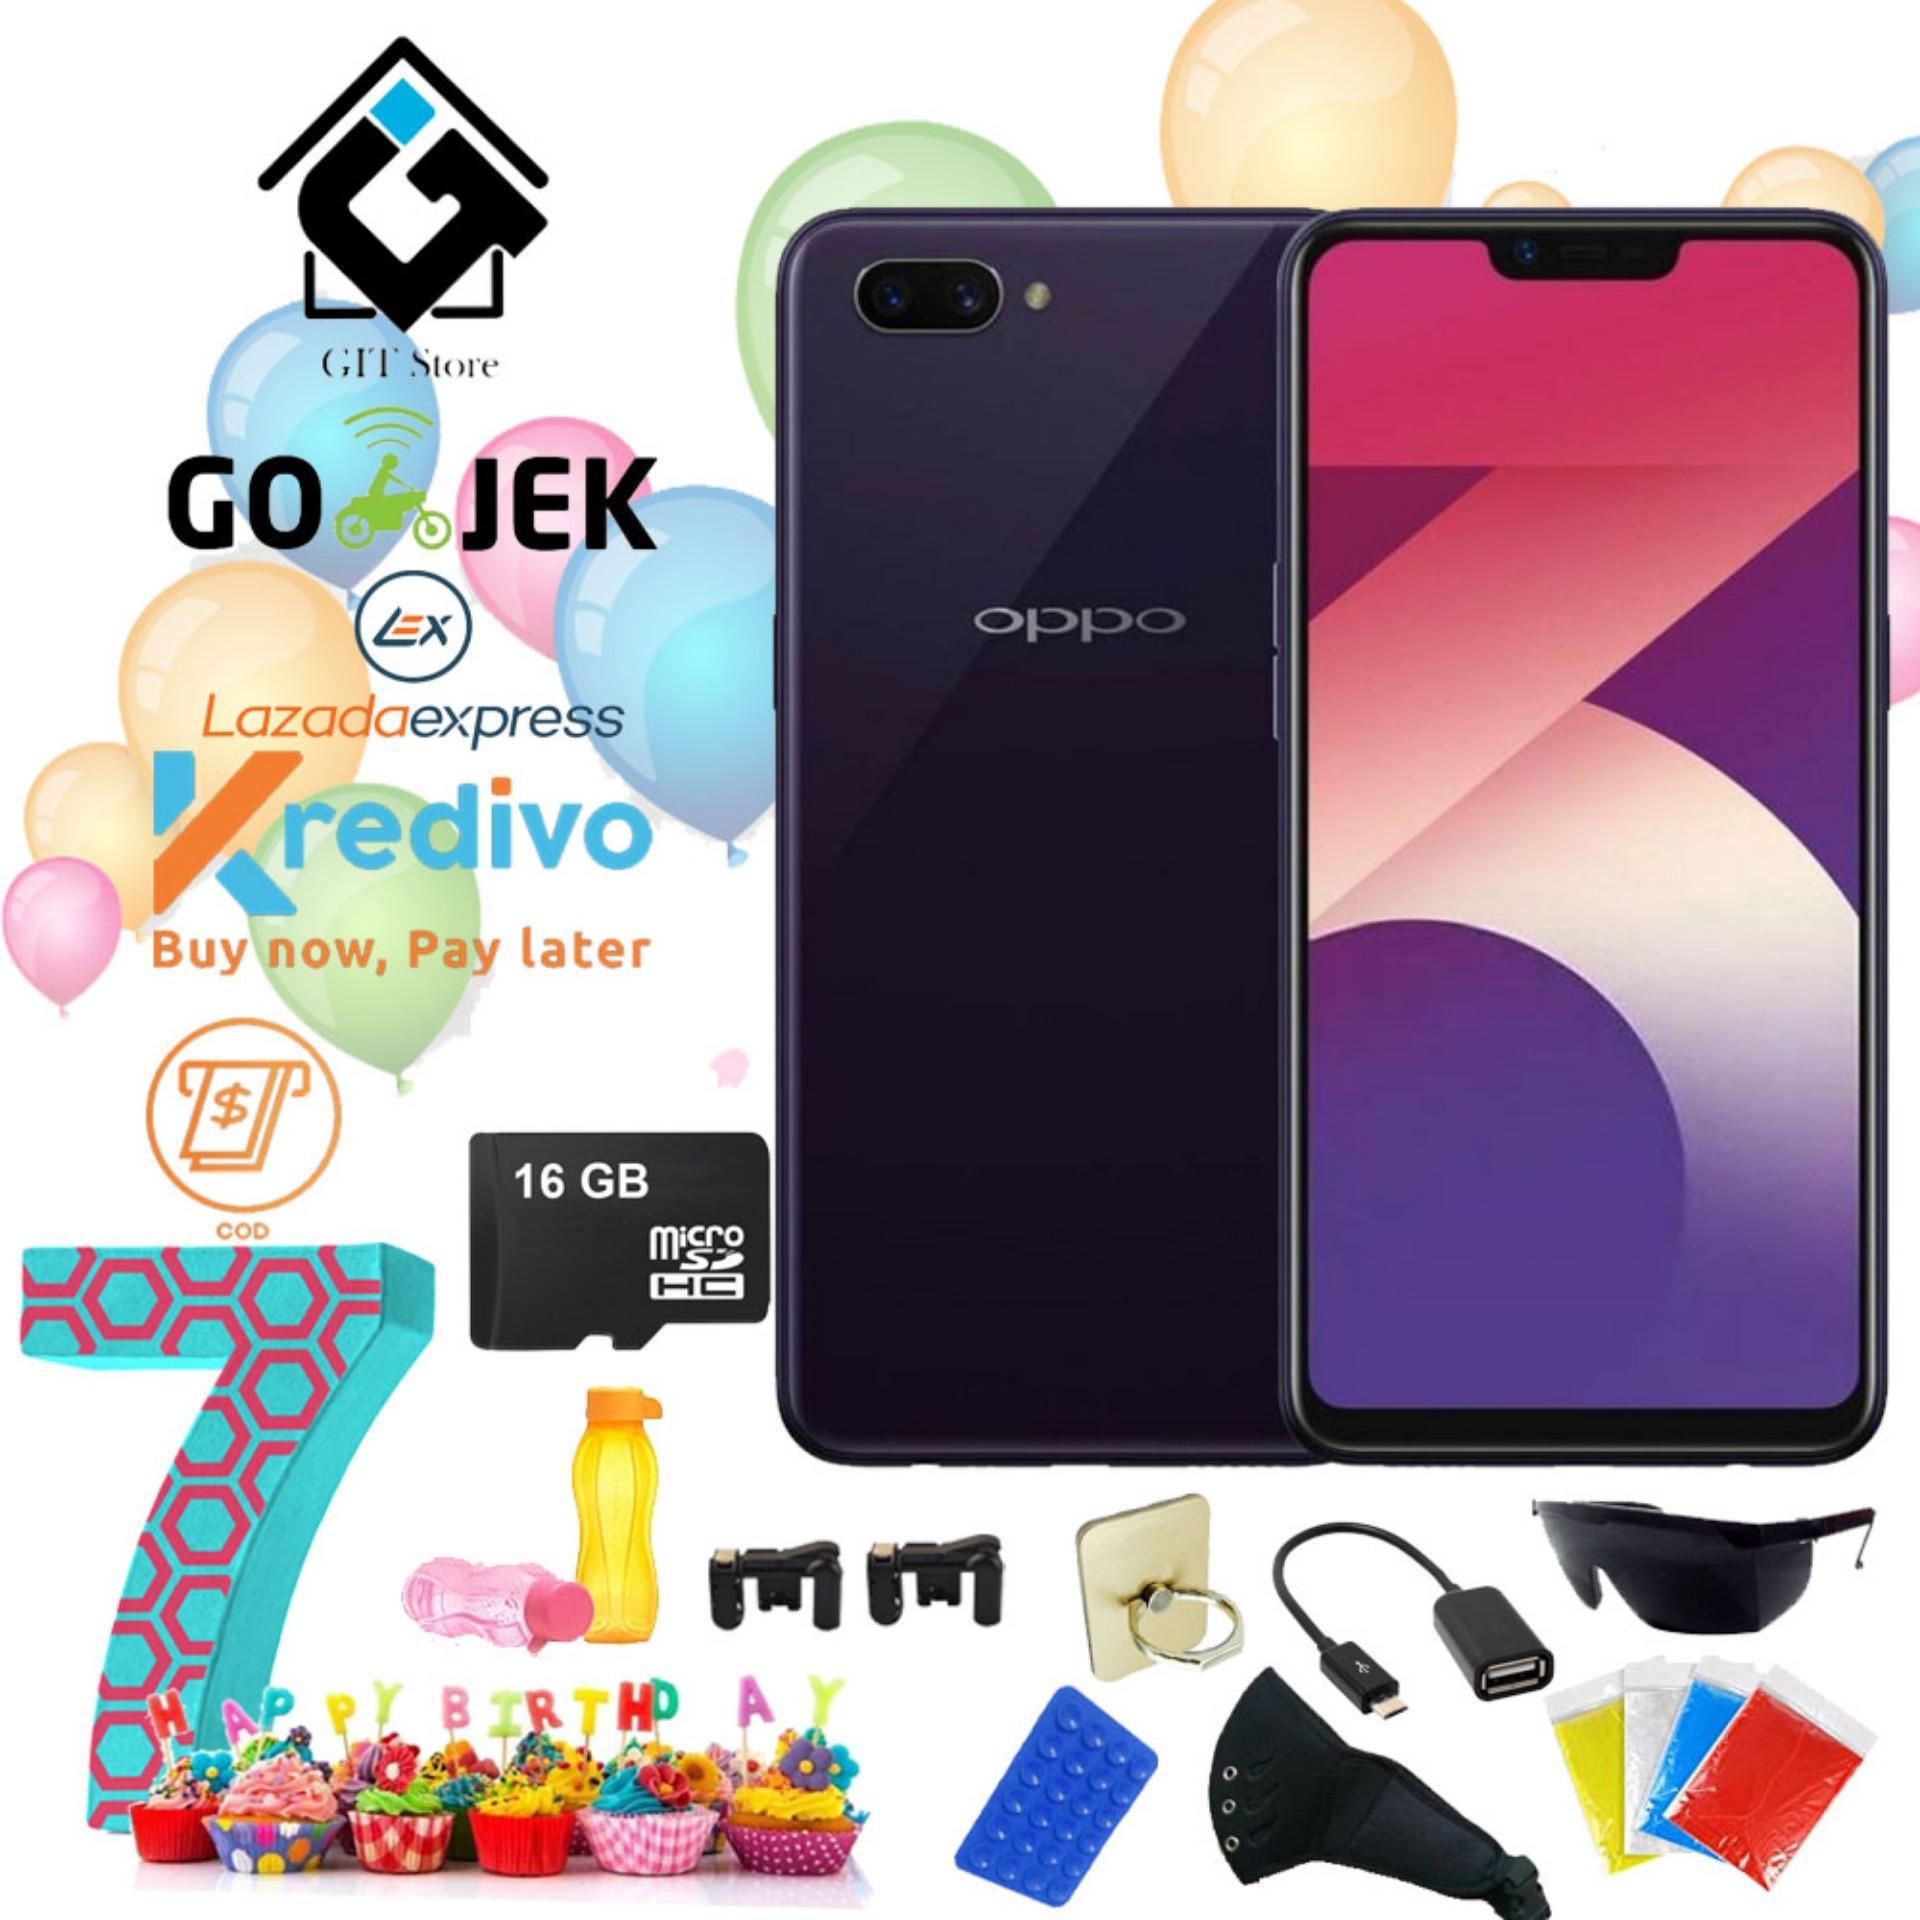 Oppo A3S Smartphone Promo Imlek